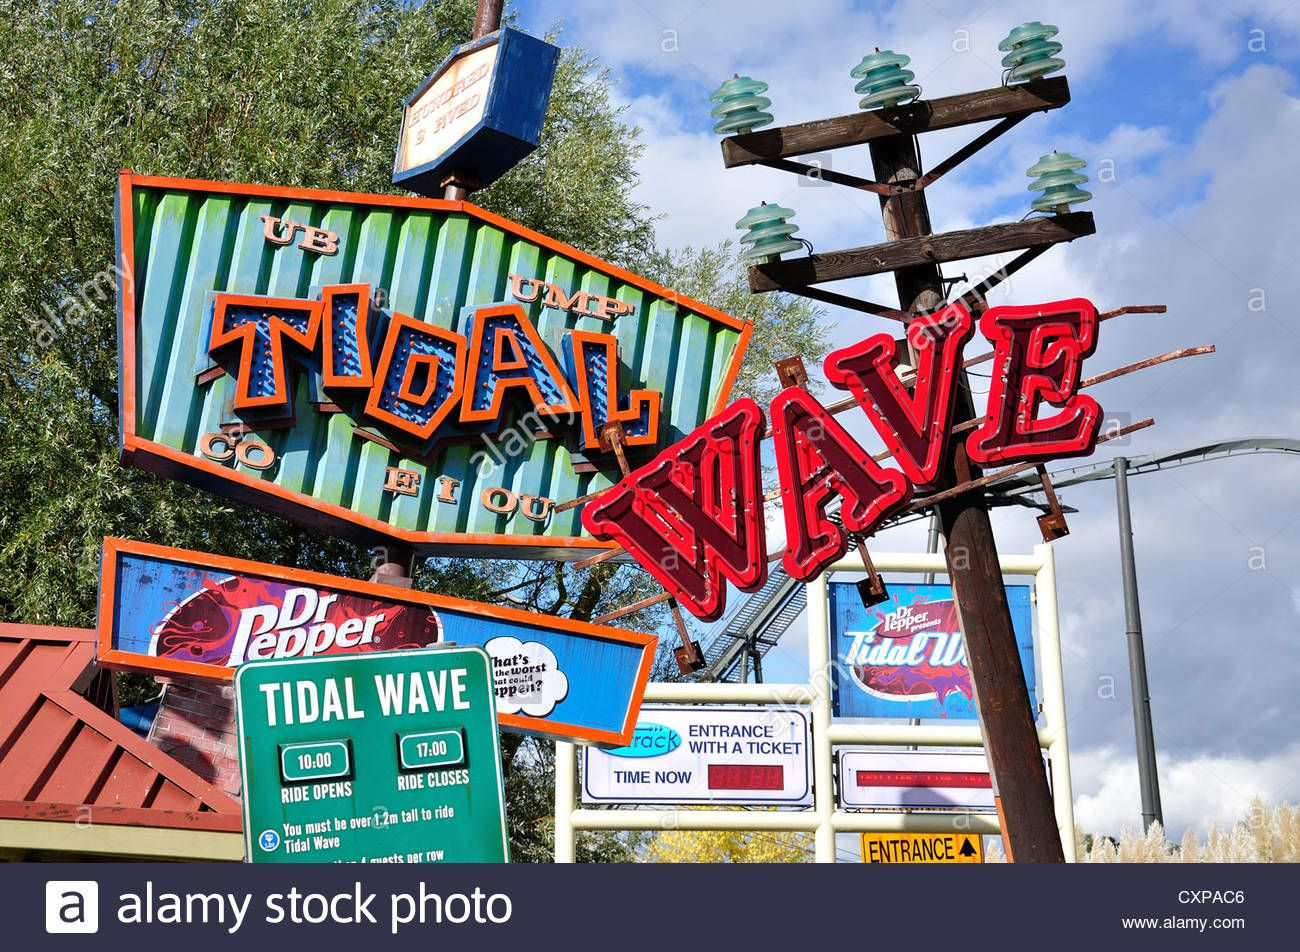 Download This Stock Image Tidal Wave Ride Signs At Thorpe Park Theme Park Chertsey Surrey England United Kingdom Cxpac6 Thorpe Park Theme Park Chertsey